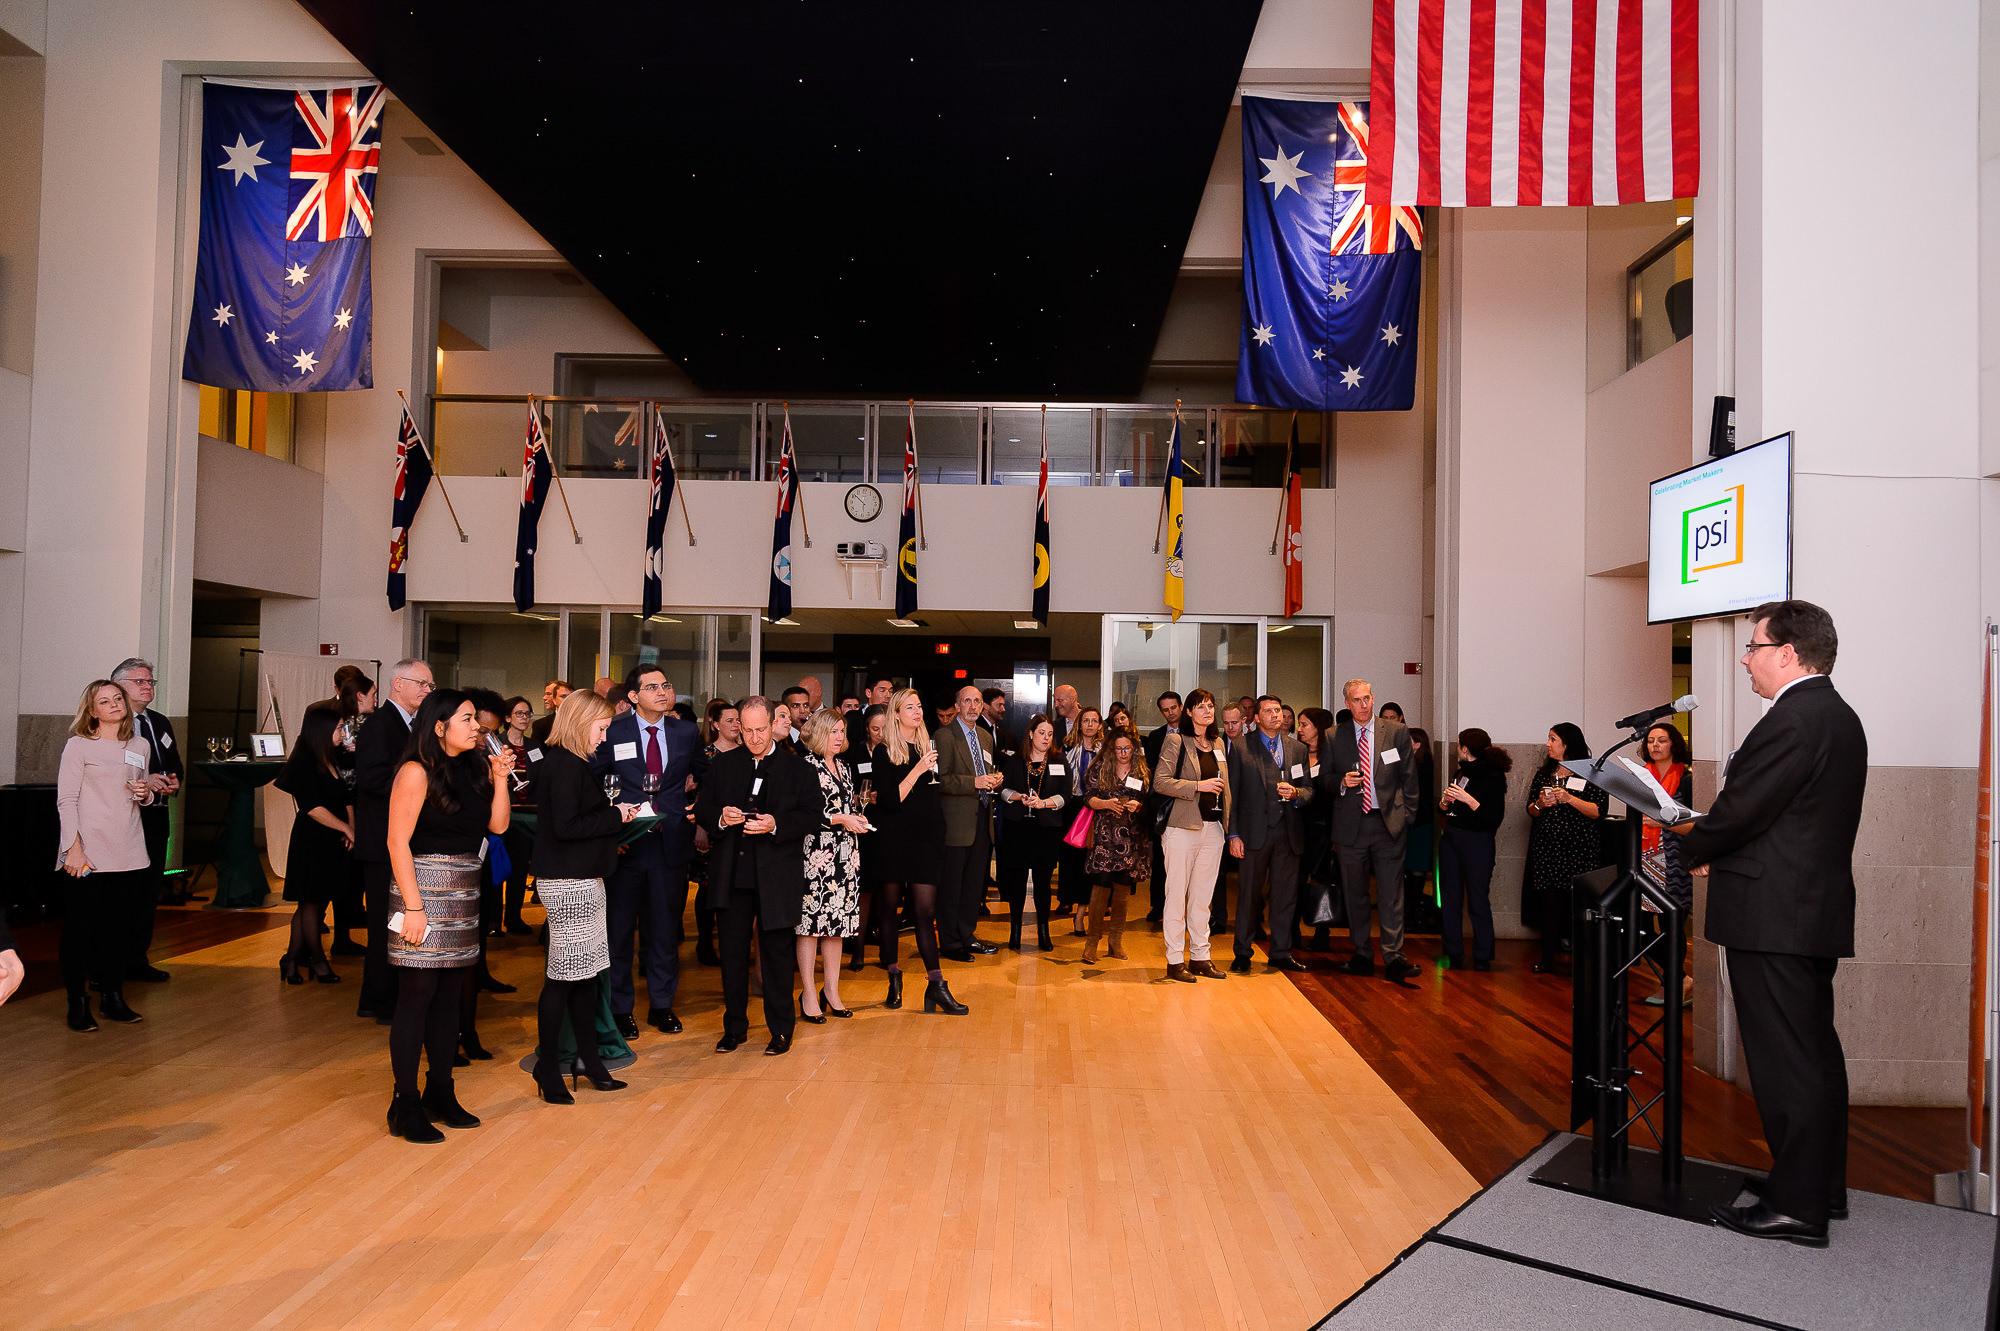 035-Christopher-Jason-Studios-austailian-embassy-washington-dc-event-photography.jpg